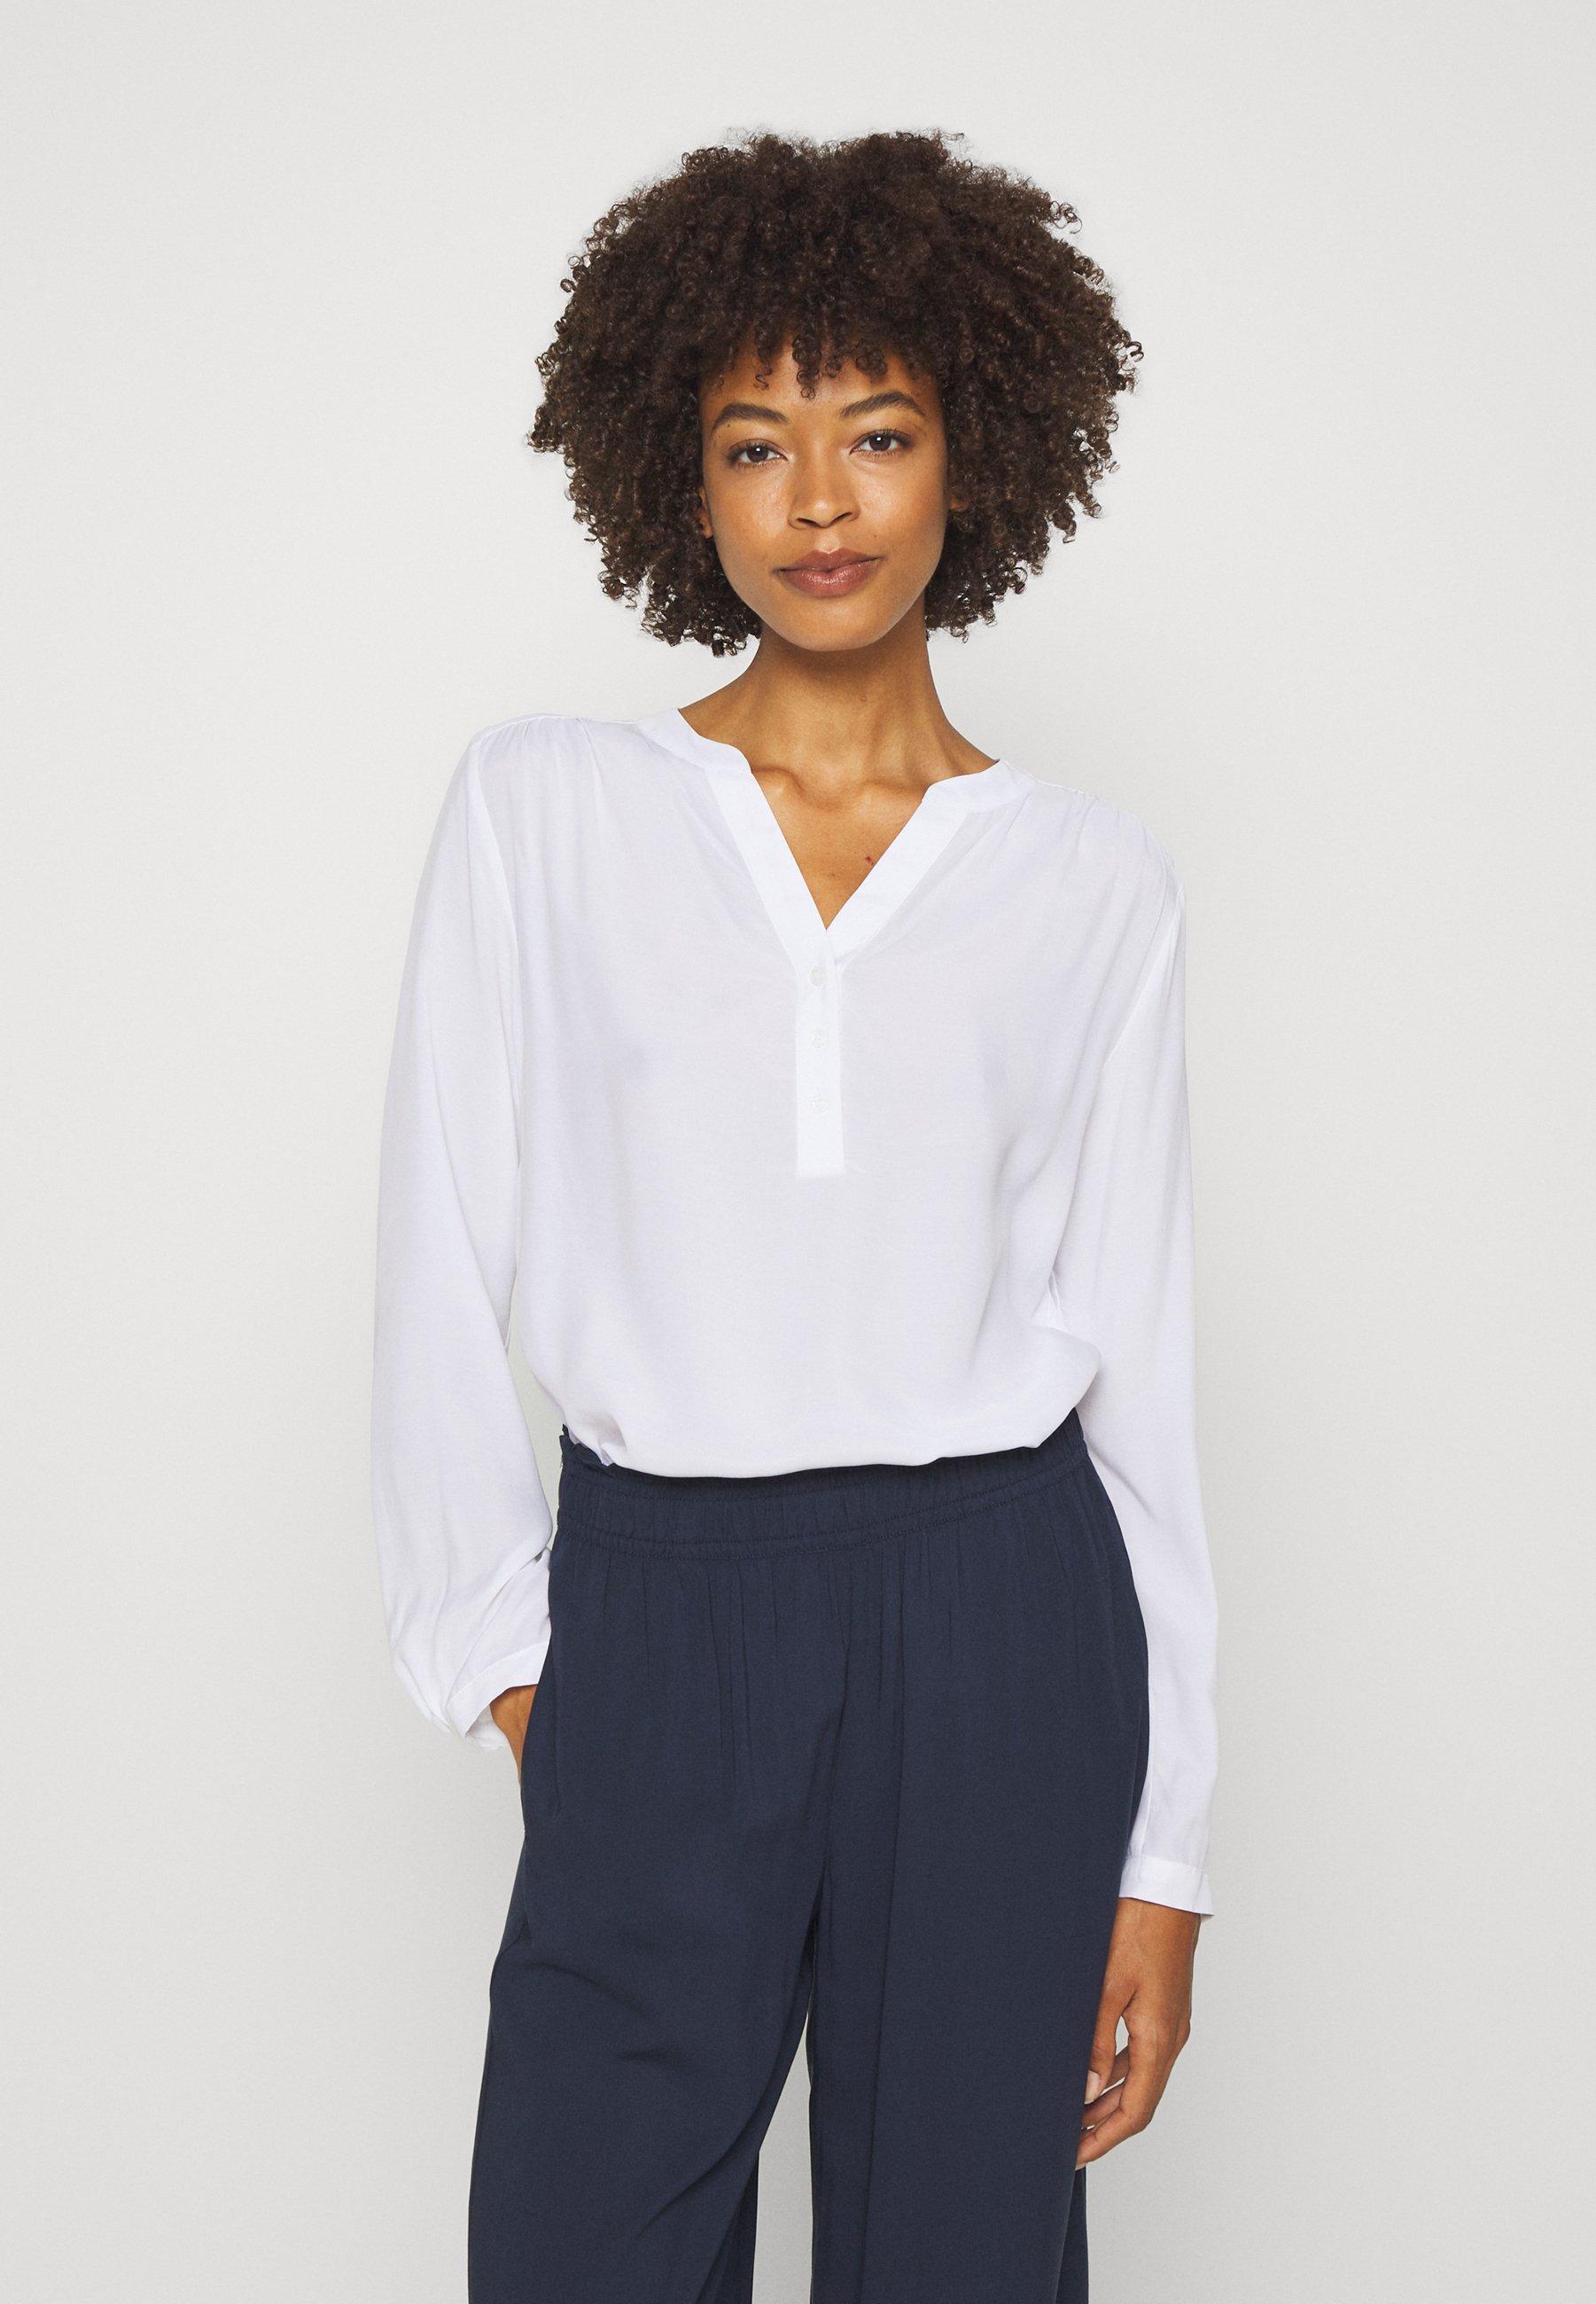 Classic Wholesale Seidensticker REGULAR FIT - Blouse - weiß | women's clothing 2020 jfZQO